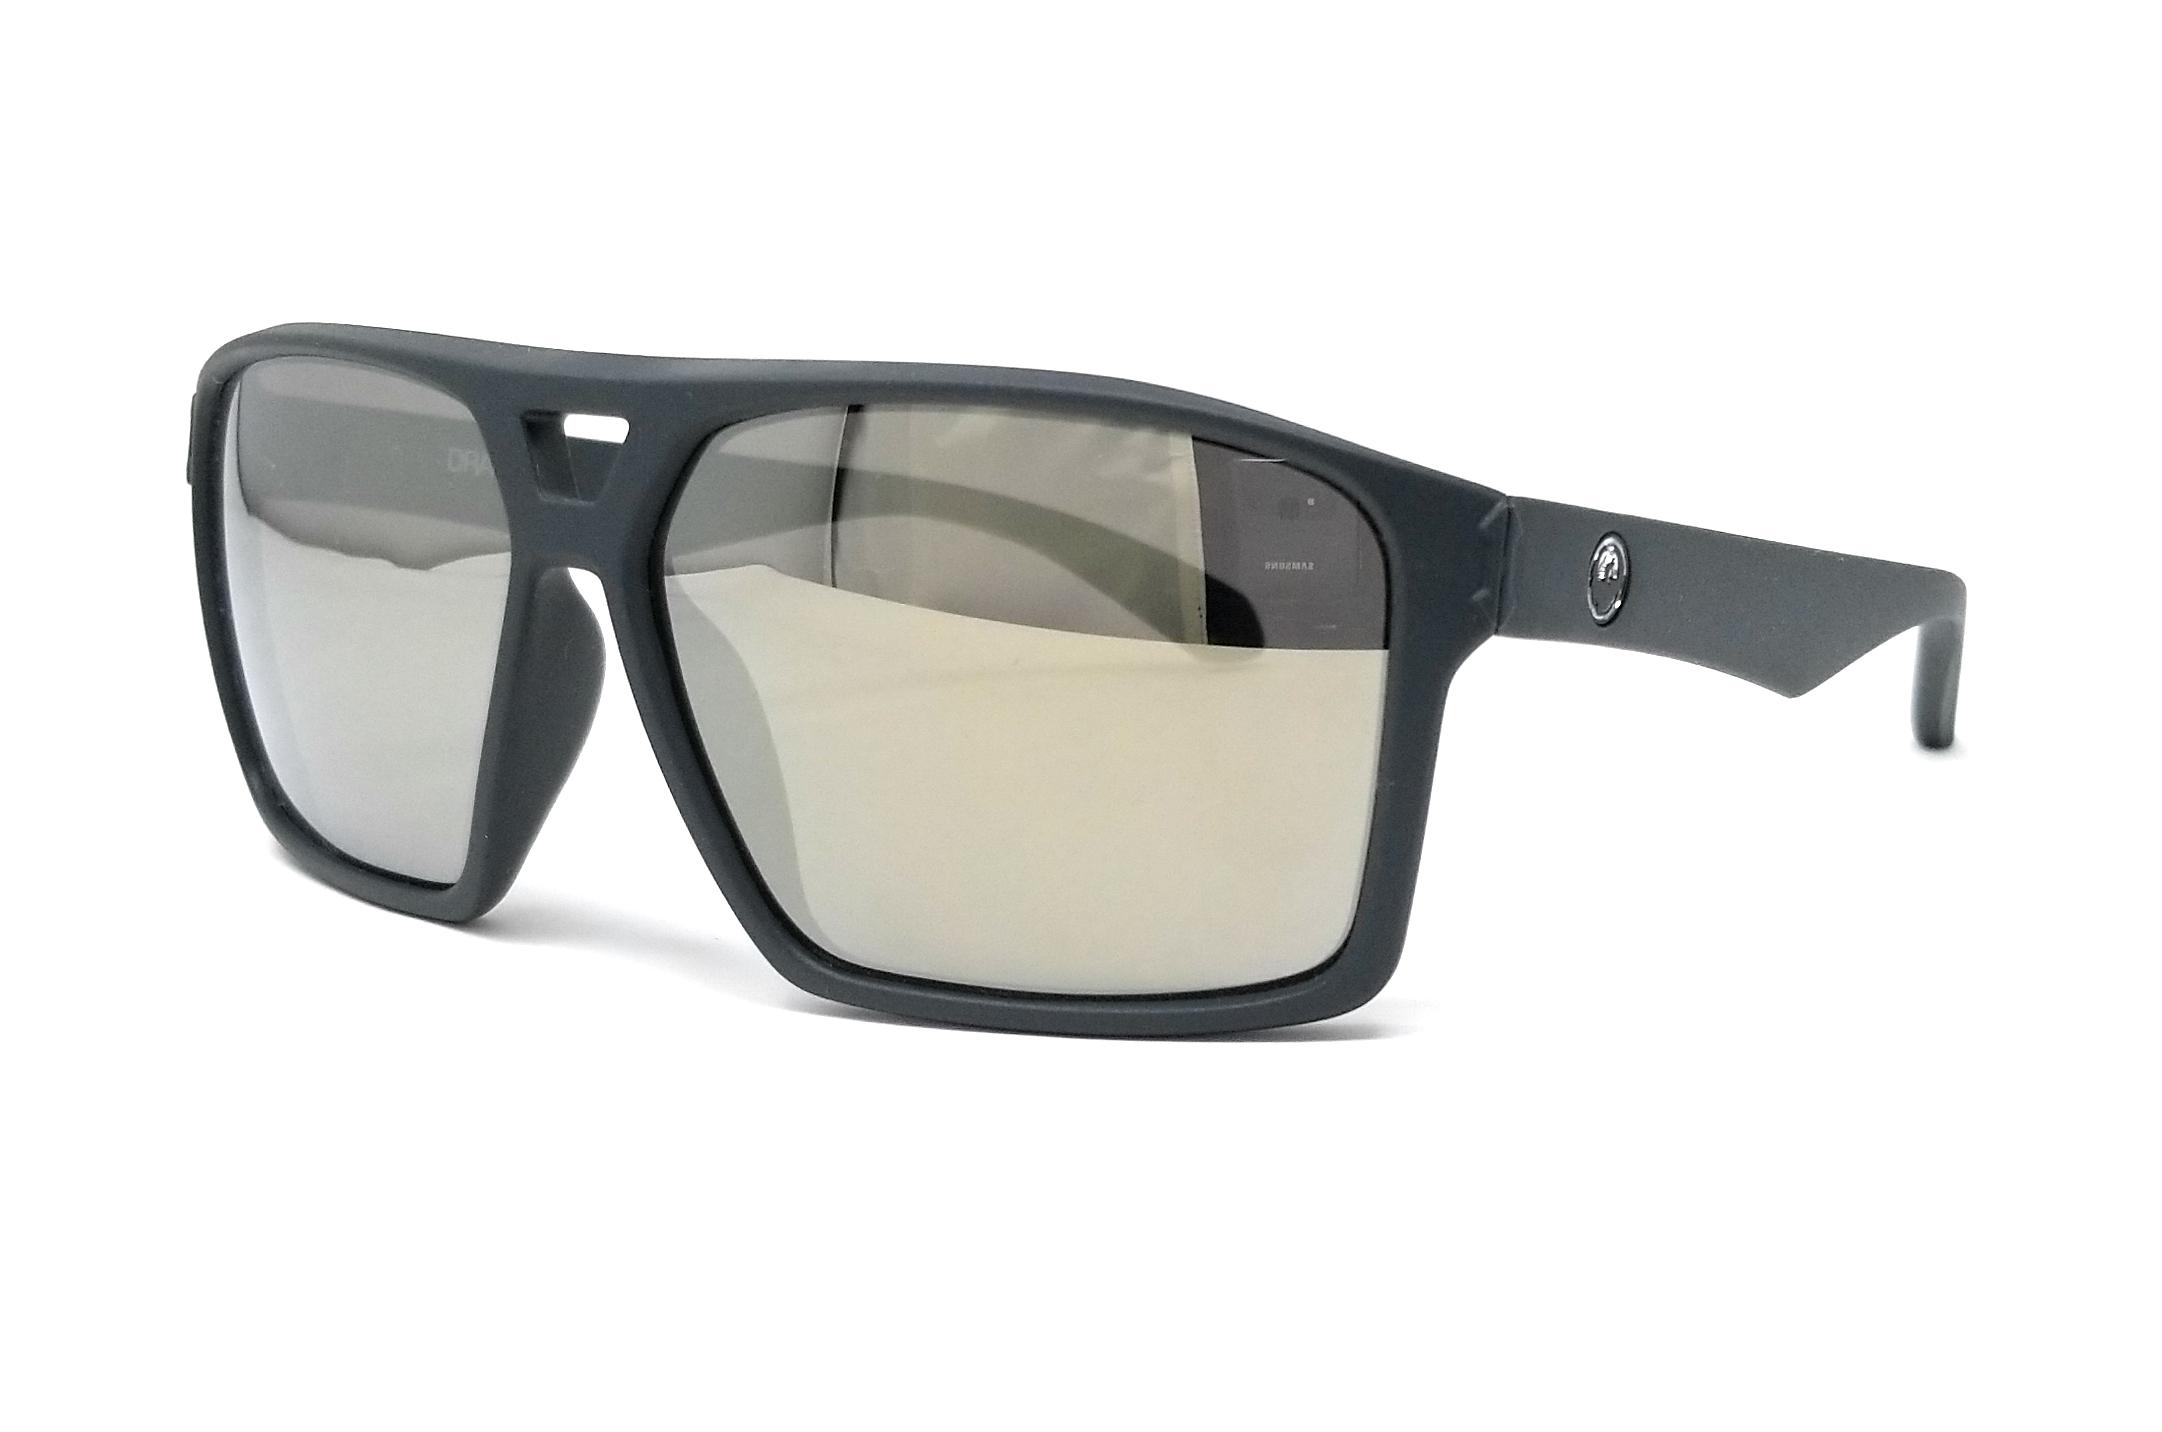 DRAGON Sunglasses CHANNEL ION 024 Matte Magnet Grey Rectangle 59x12x145